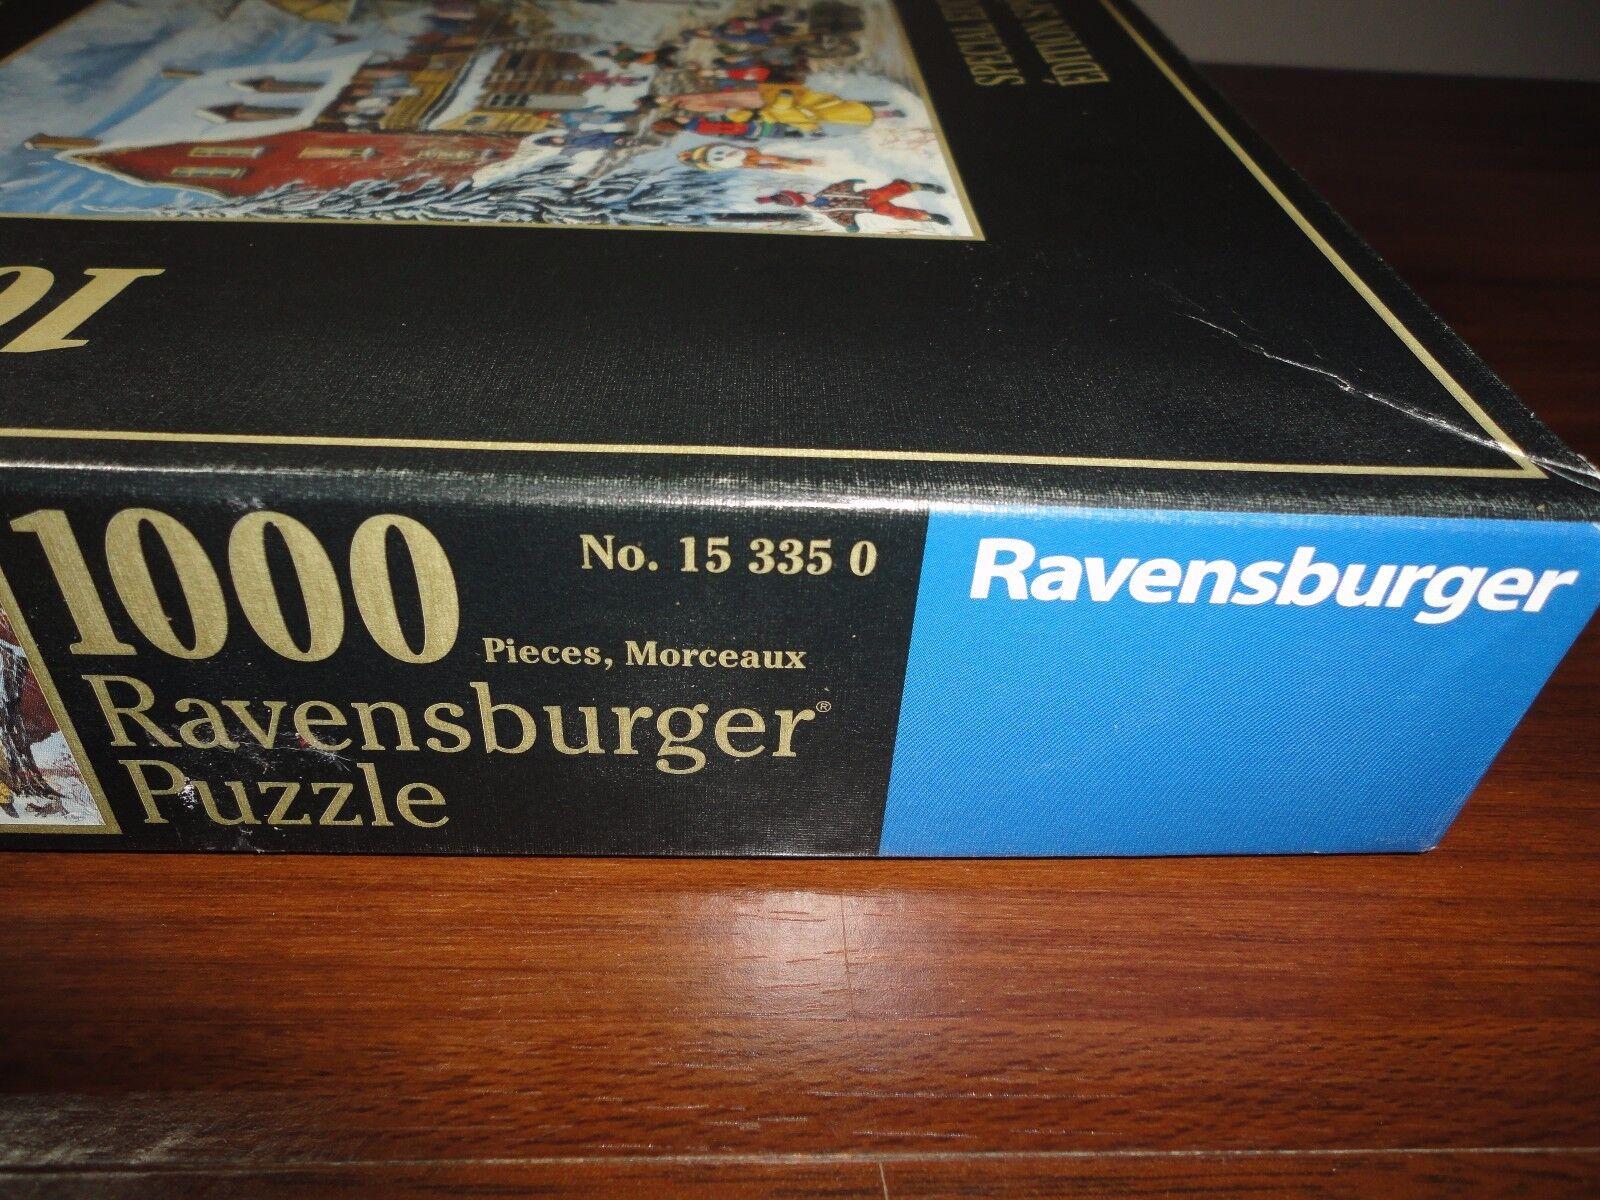 Ravensburger 2005 Puzzle Canadian Artist Pauline Paquin Lots